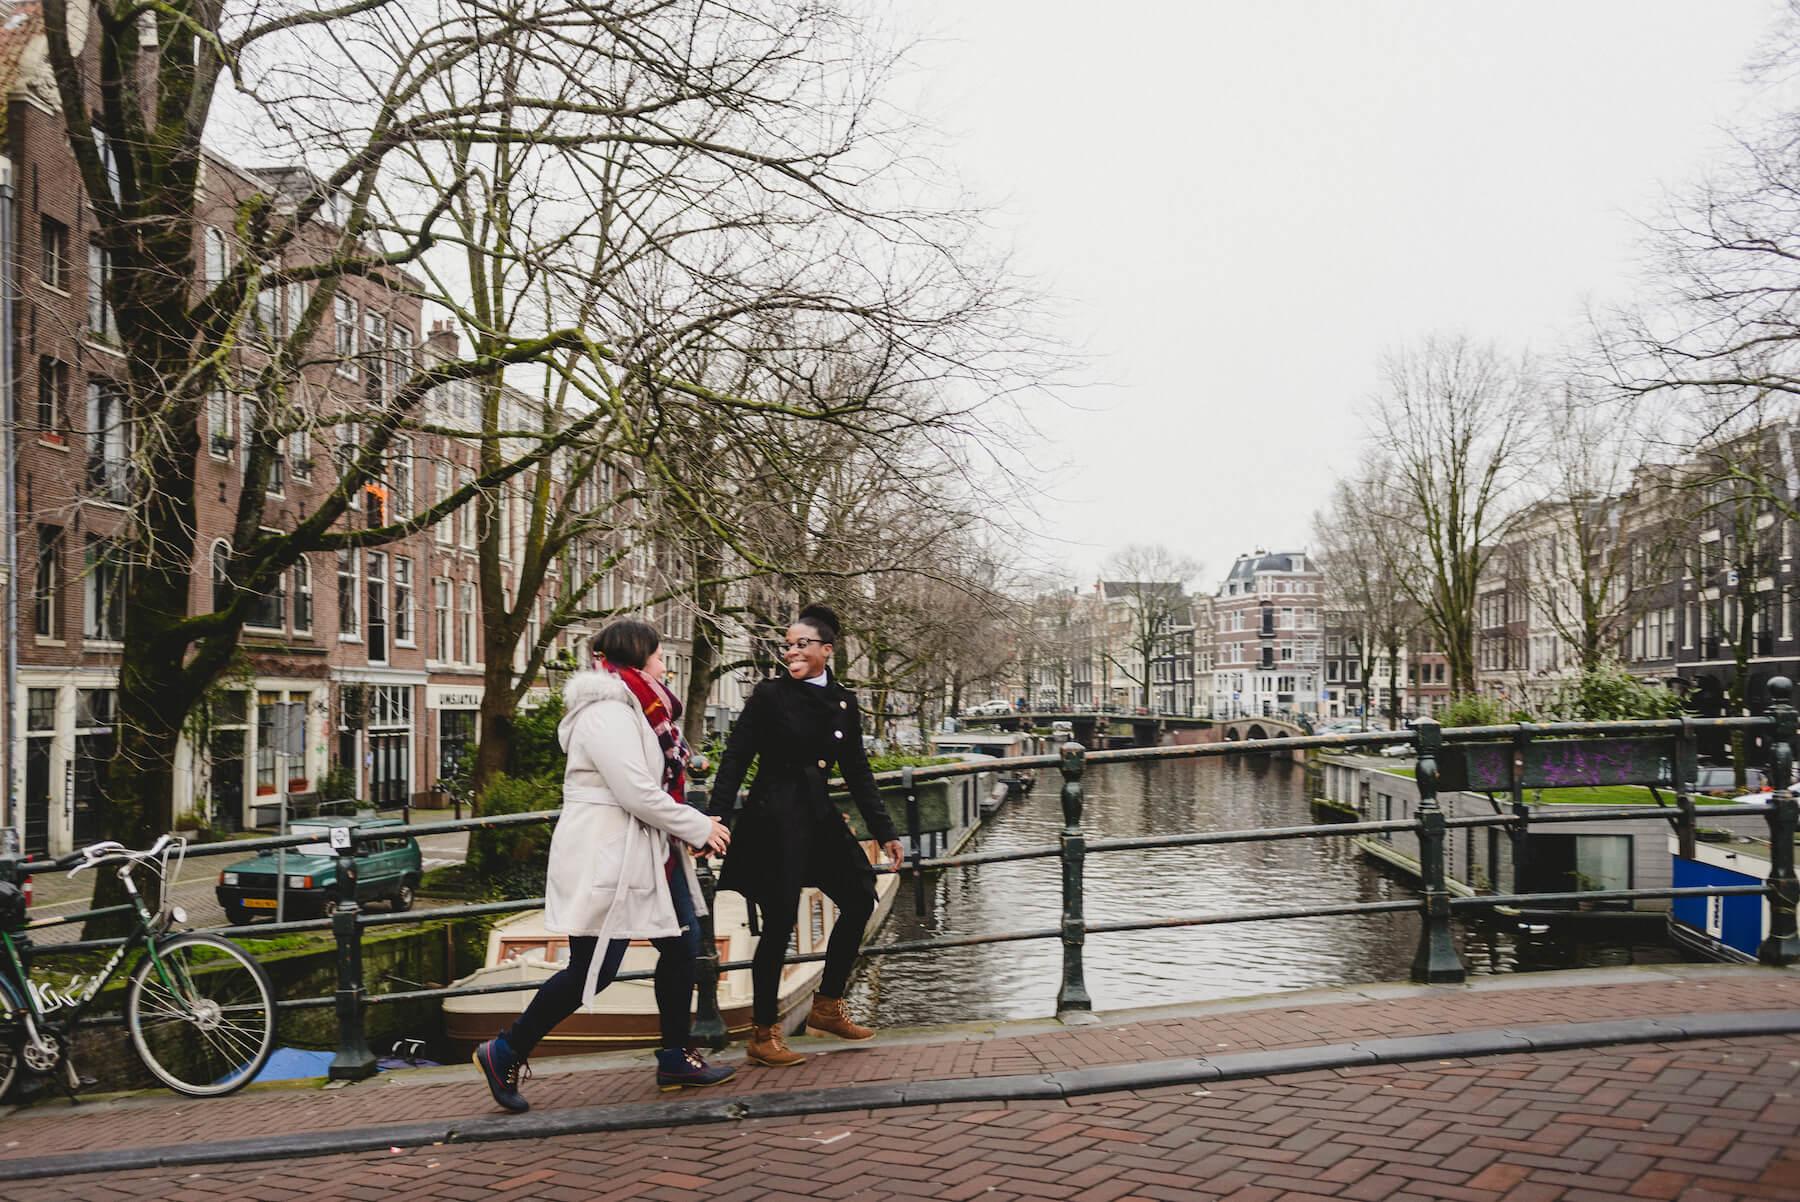 amsterdam-12-26-2019-couples-trip-2_original